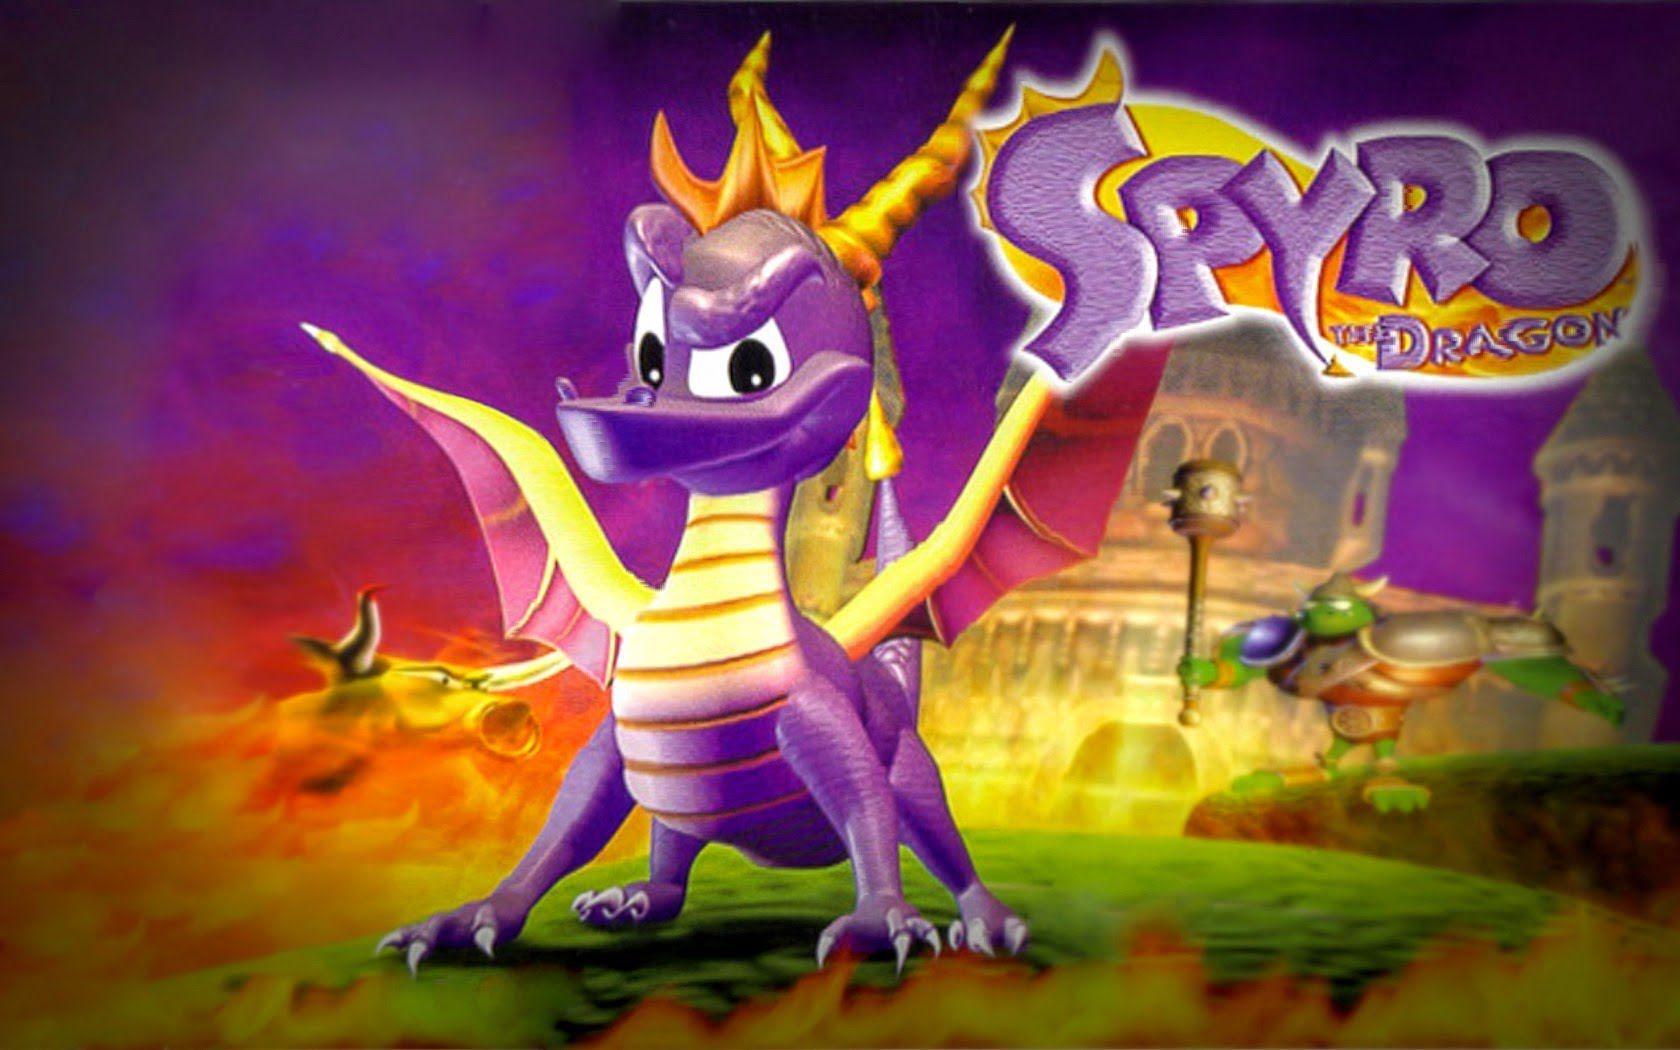 CONFIRMADO! Spyro the Dragon ganha trilogia remasterizada